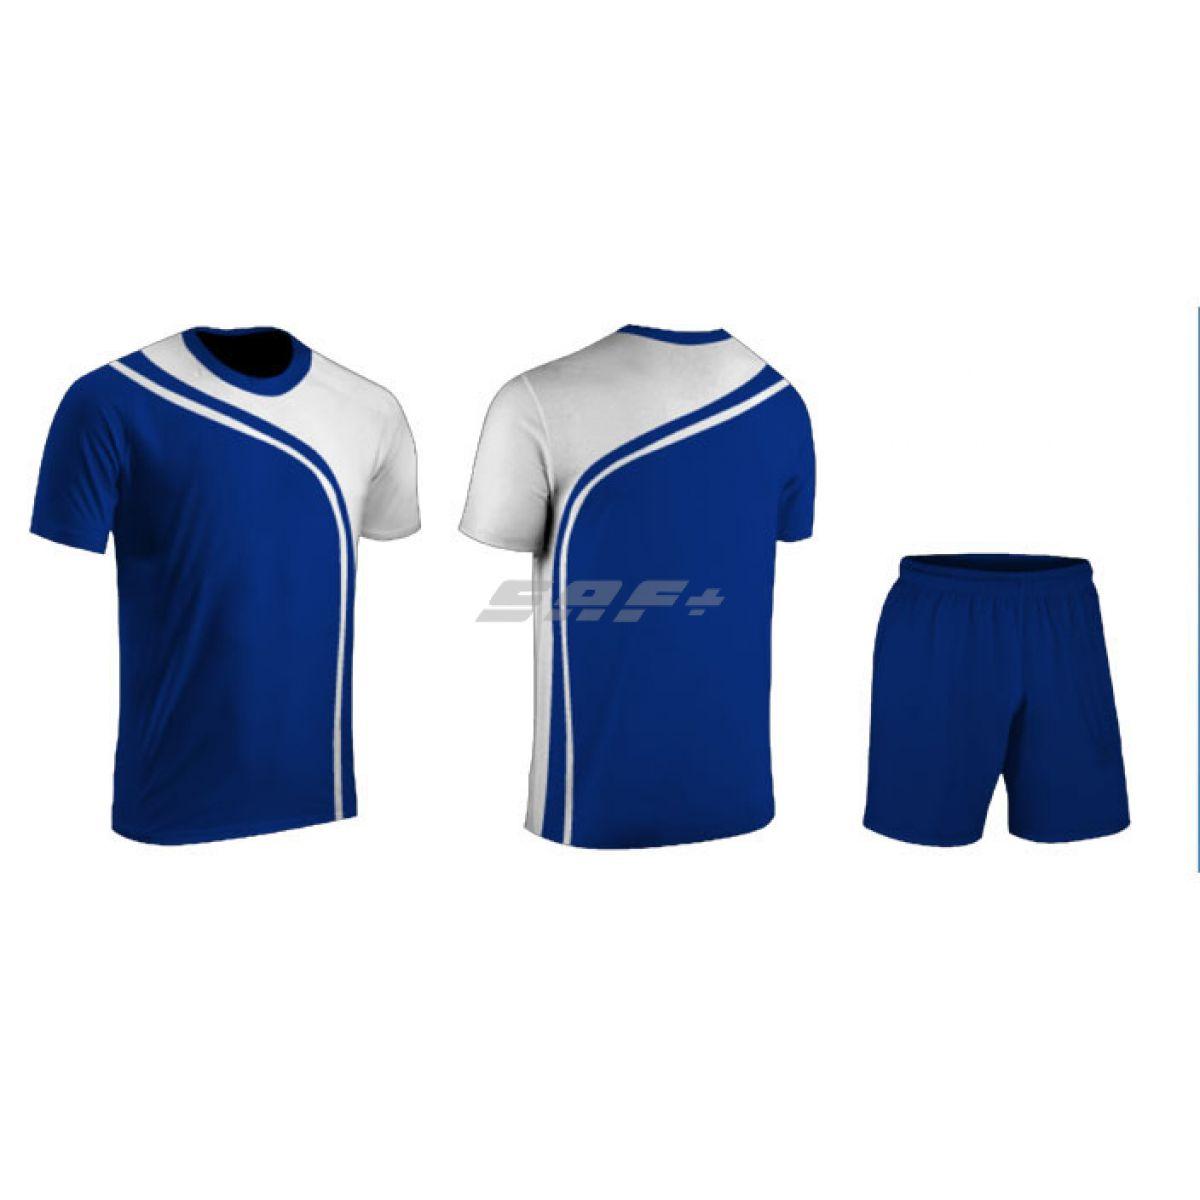 S.A.F. - стильная футбольная форма на заказ 4e8e283f771